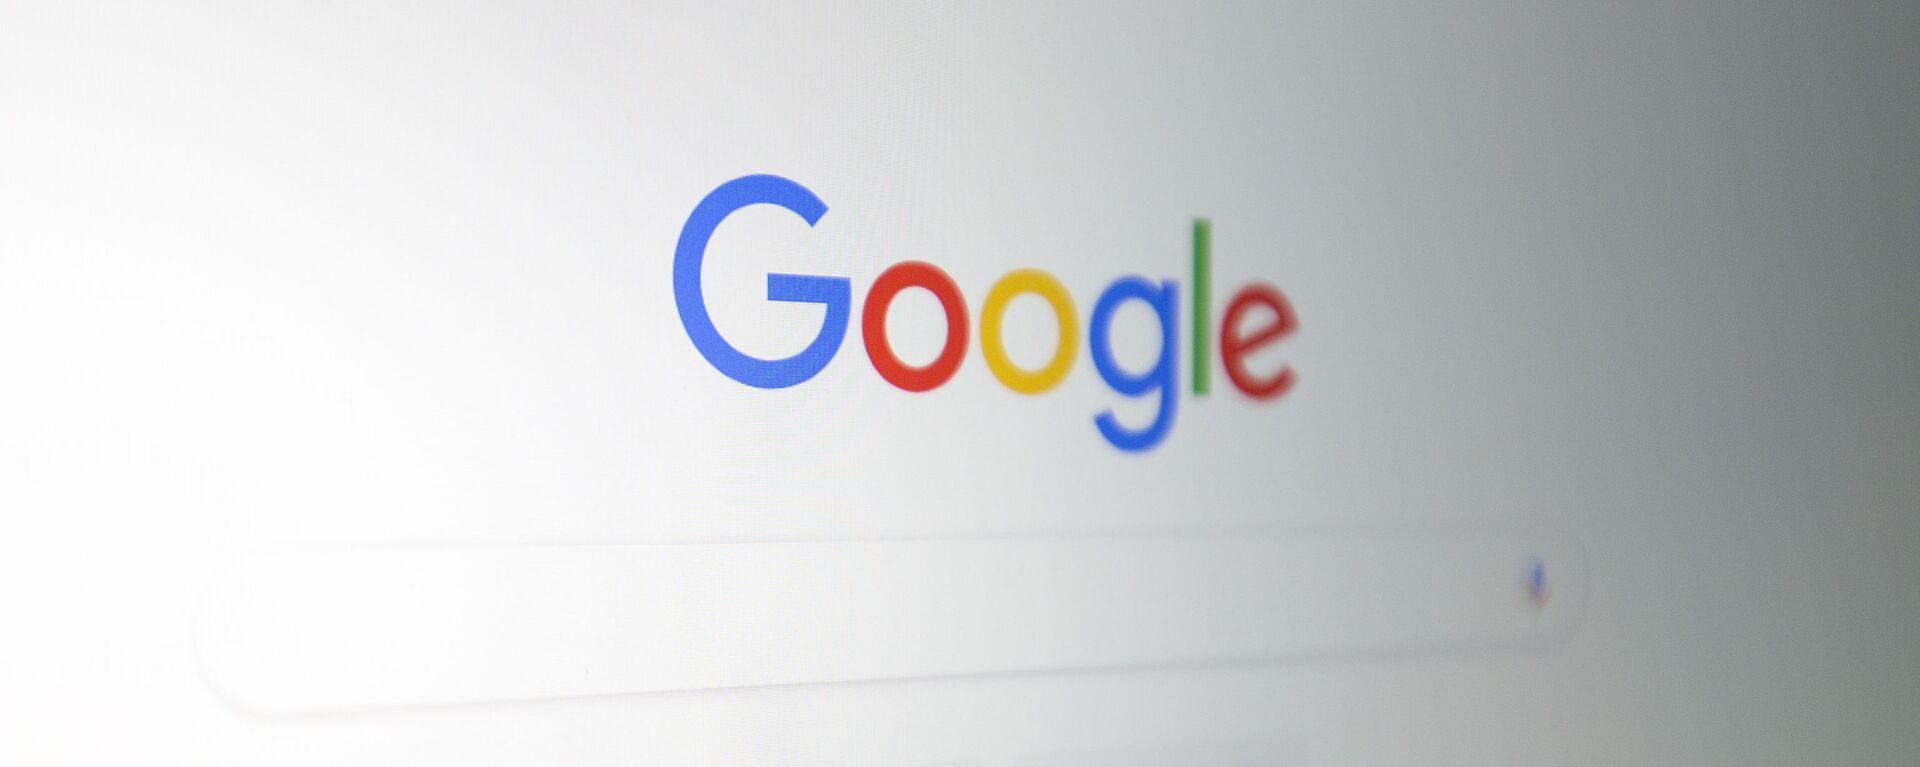 Поисковик Google - Sputnik Абхазия, 1920, 08.02.2021